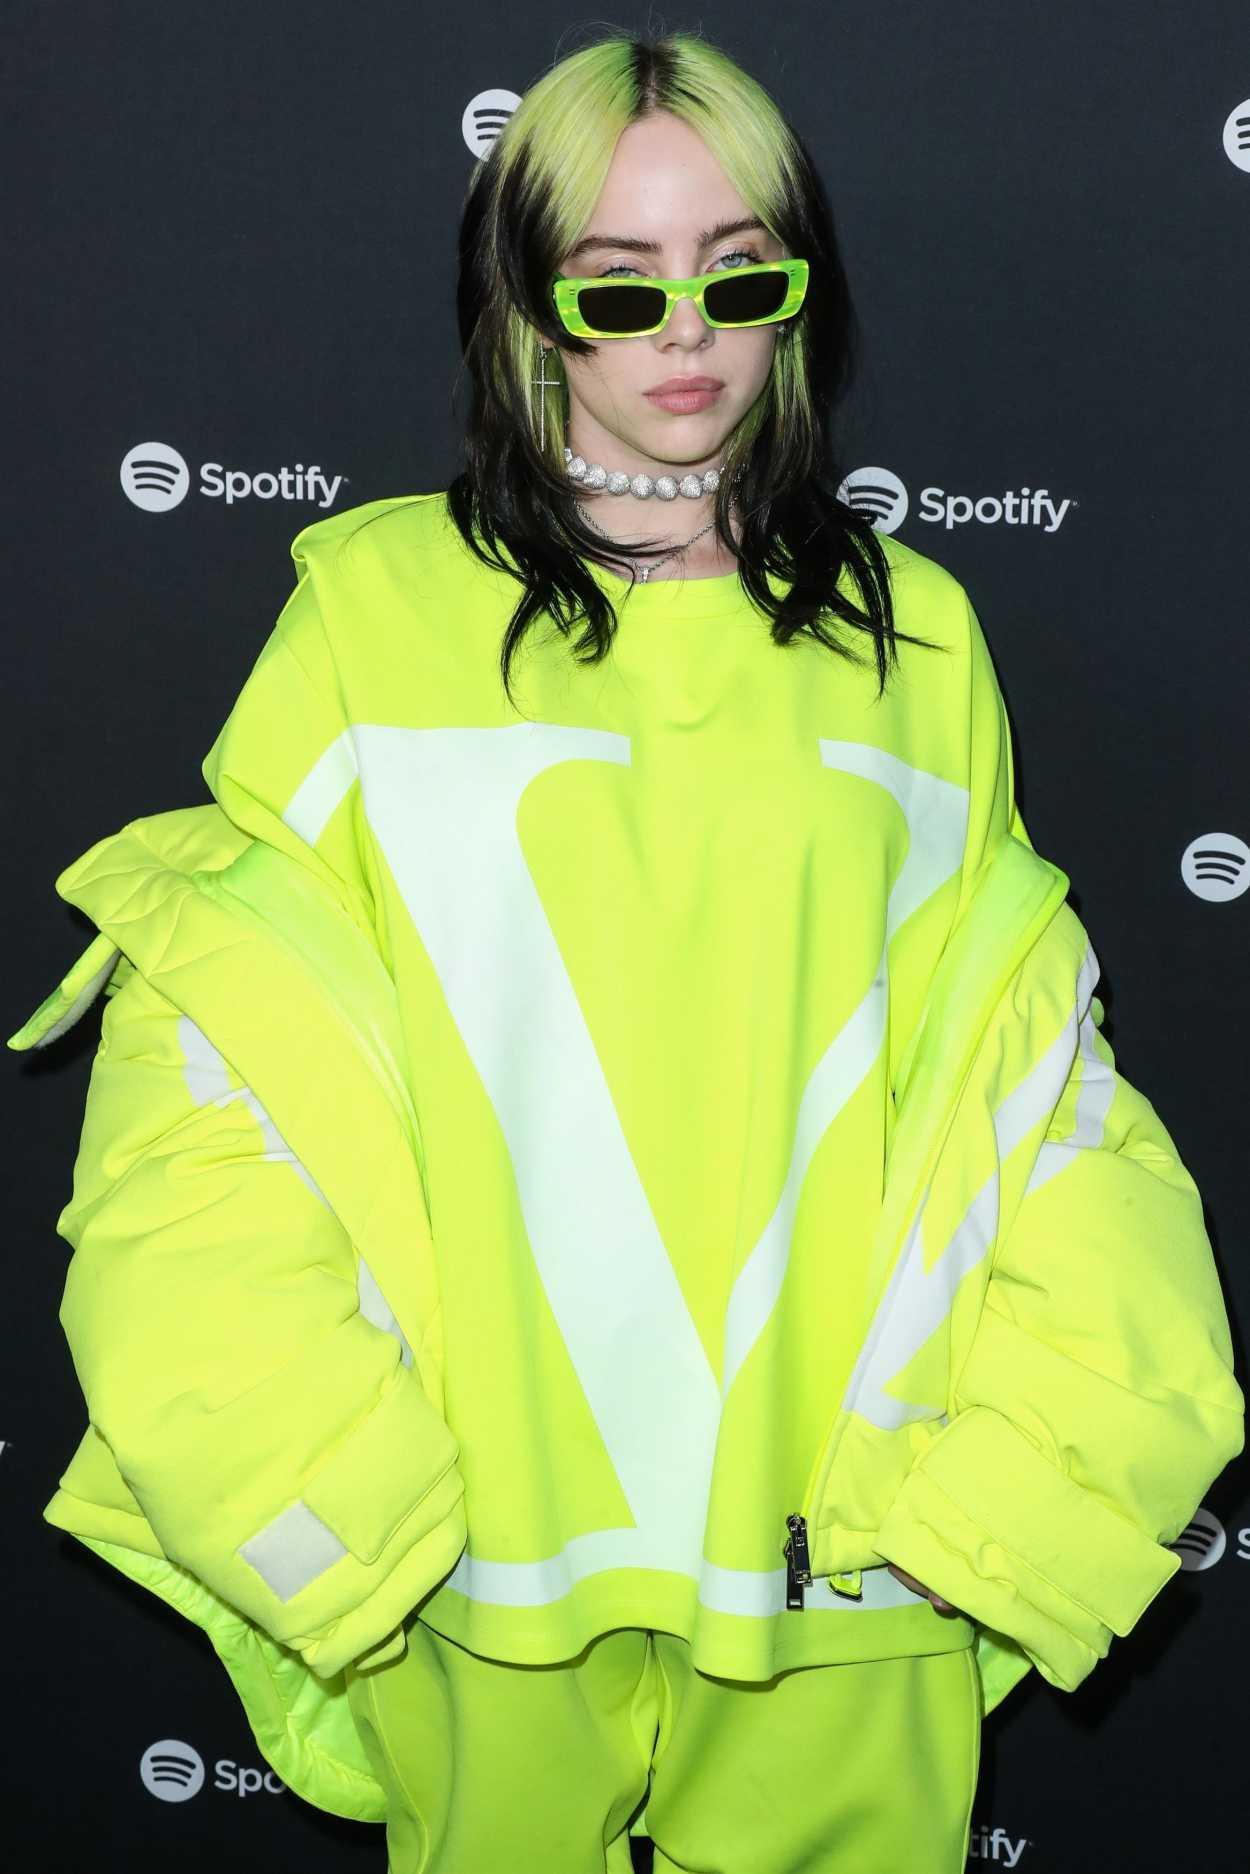 Billie Eilish Attends 2020 Spotify Best New Artist Party ...